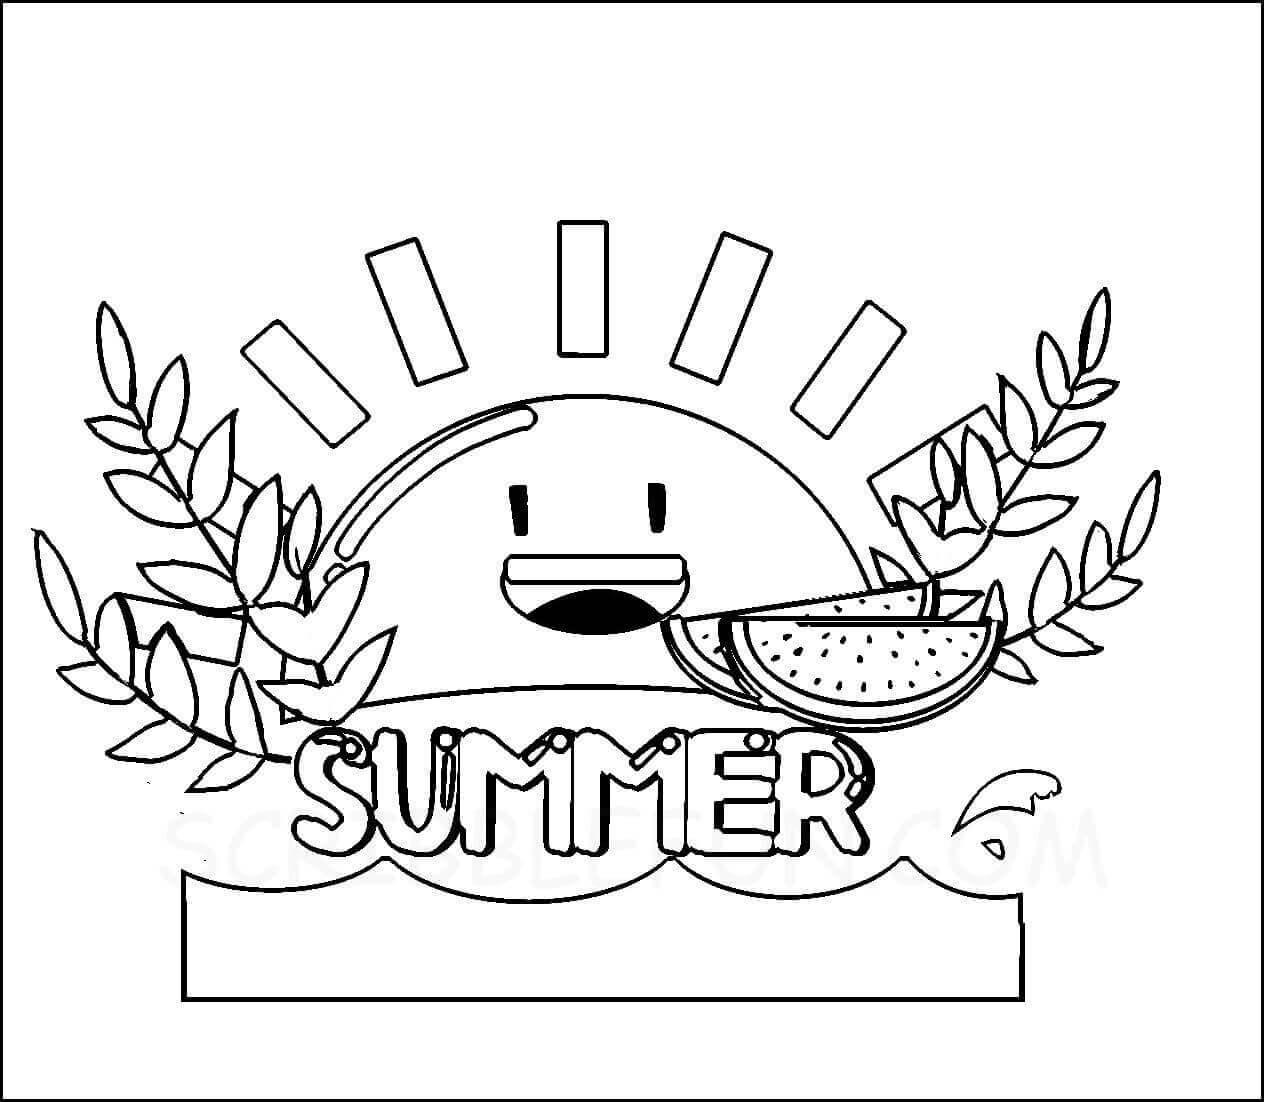 Summer sun coloring sheet